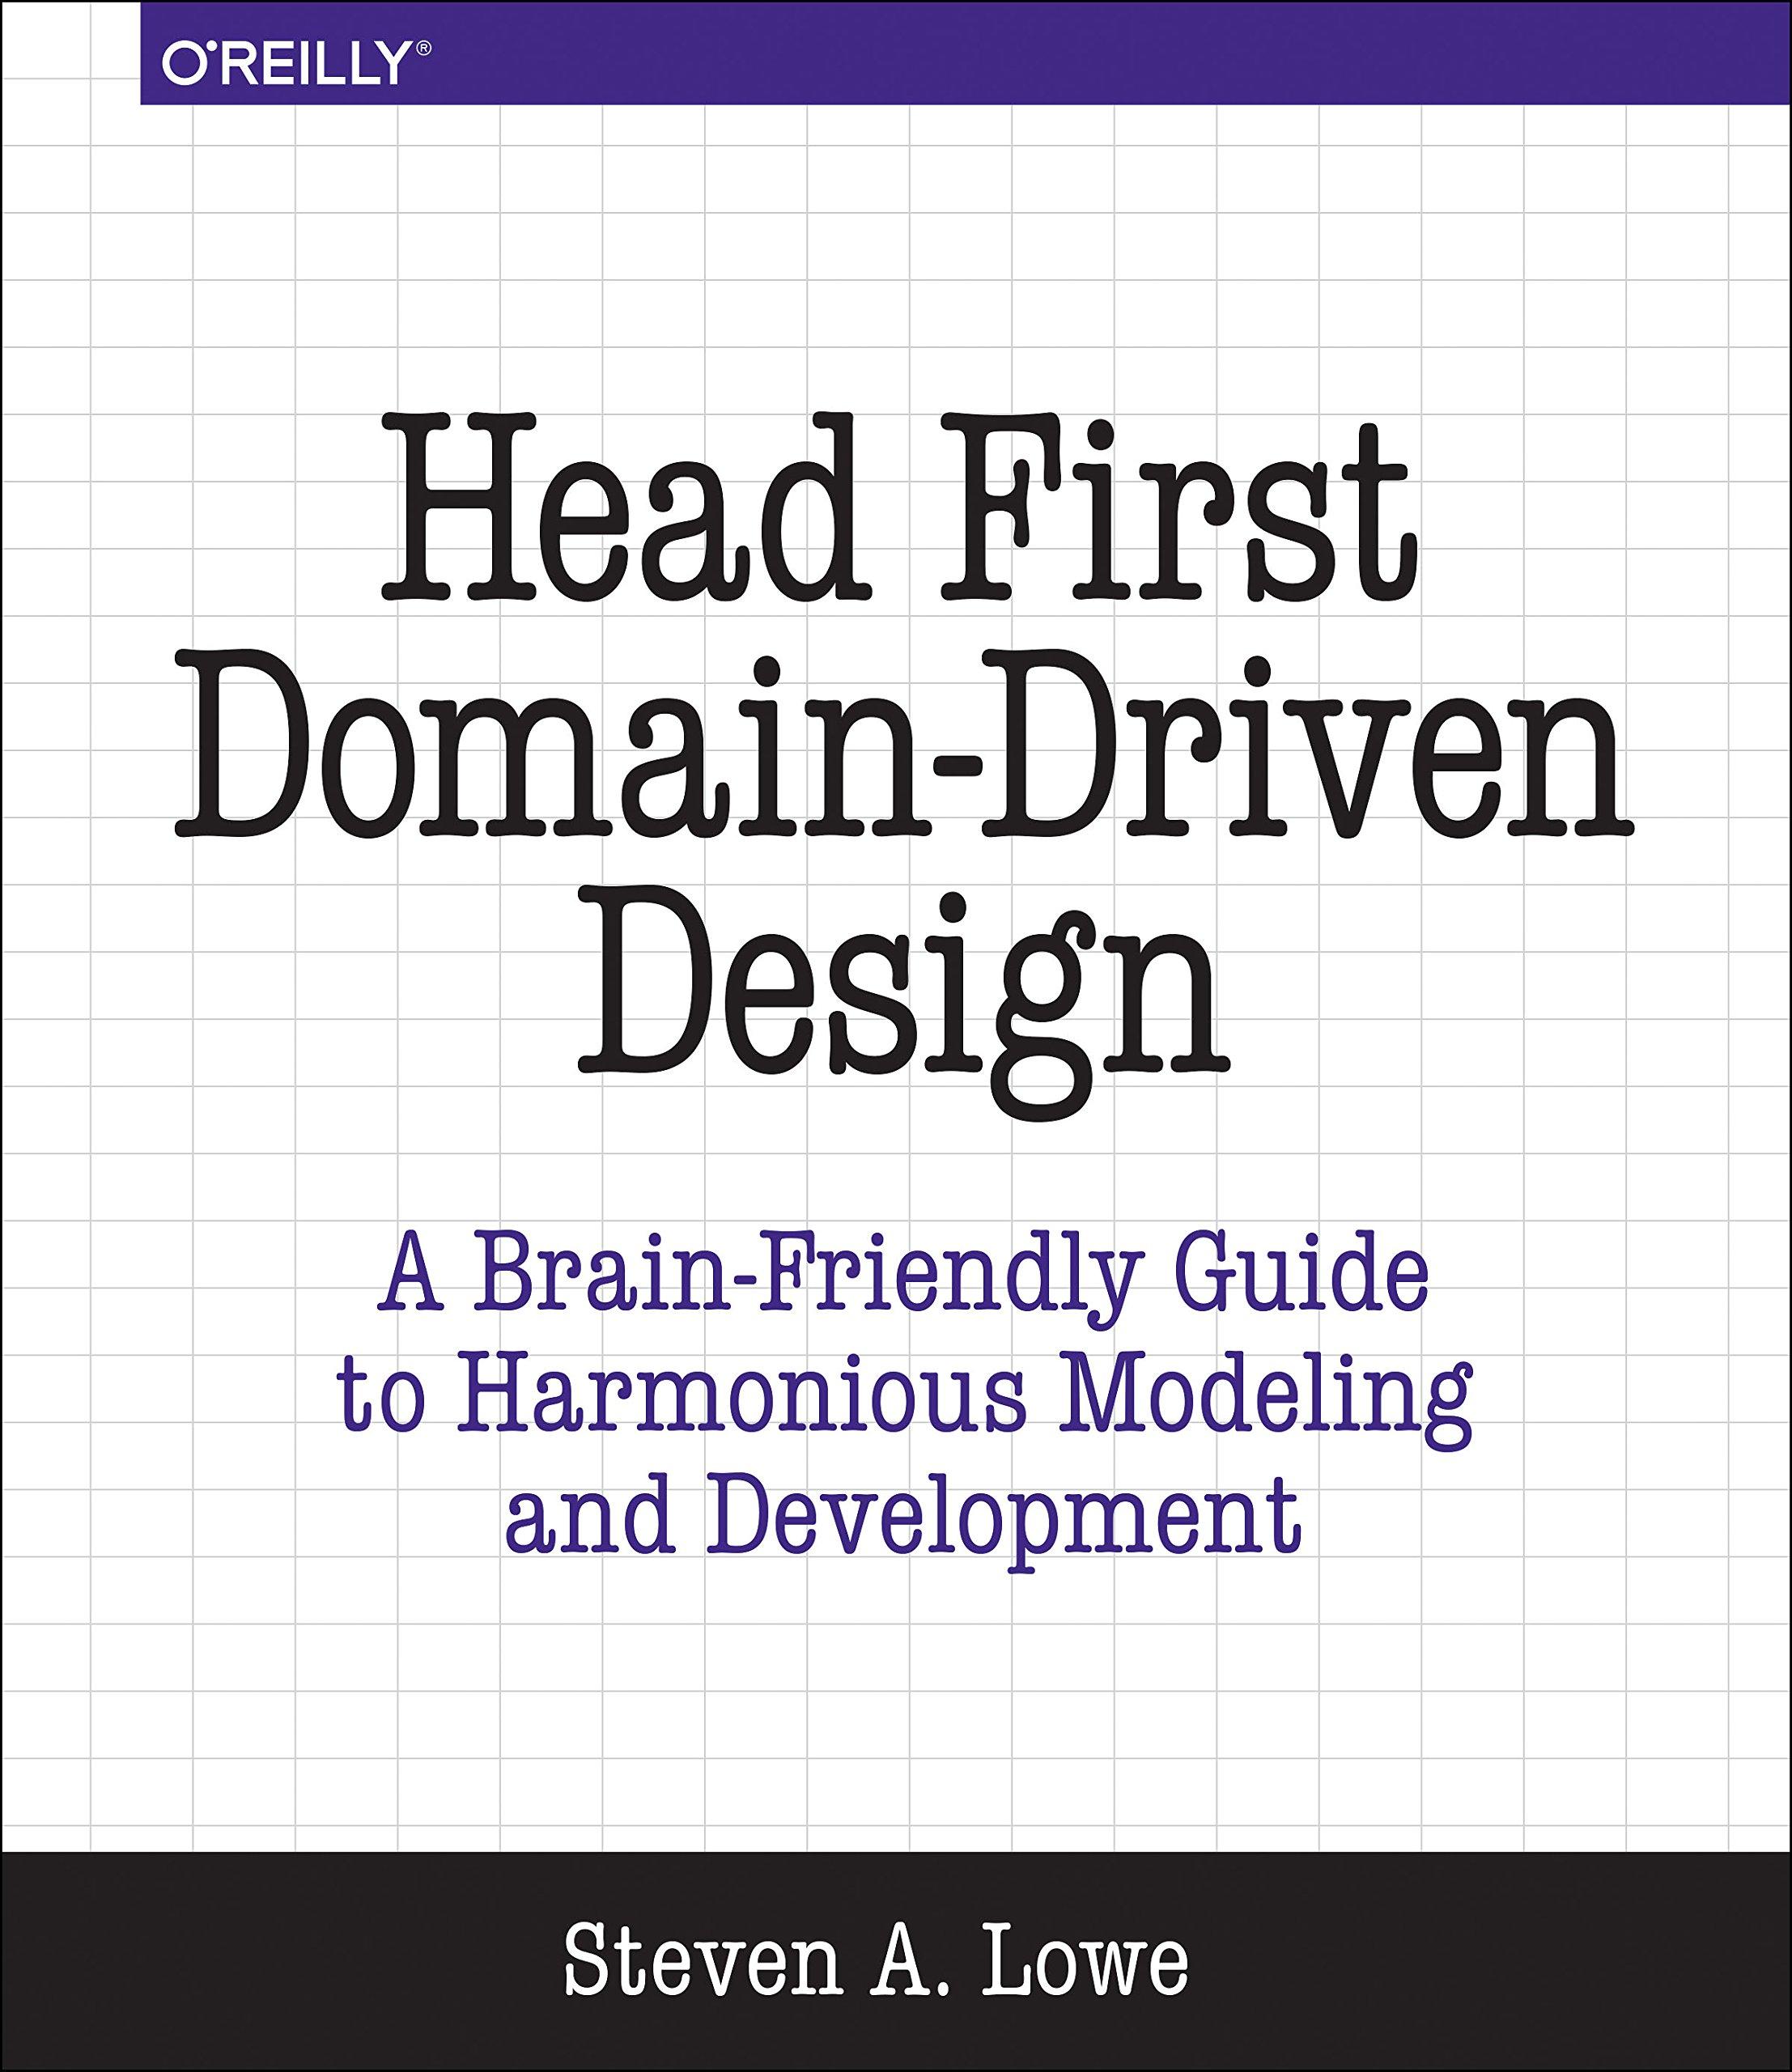 Head First Domain-Driven Design: A Brain-Friendly Guide to ...